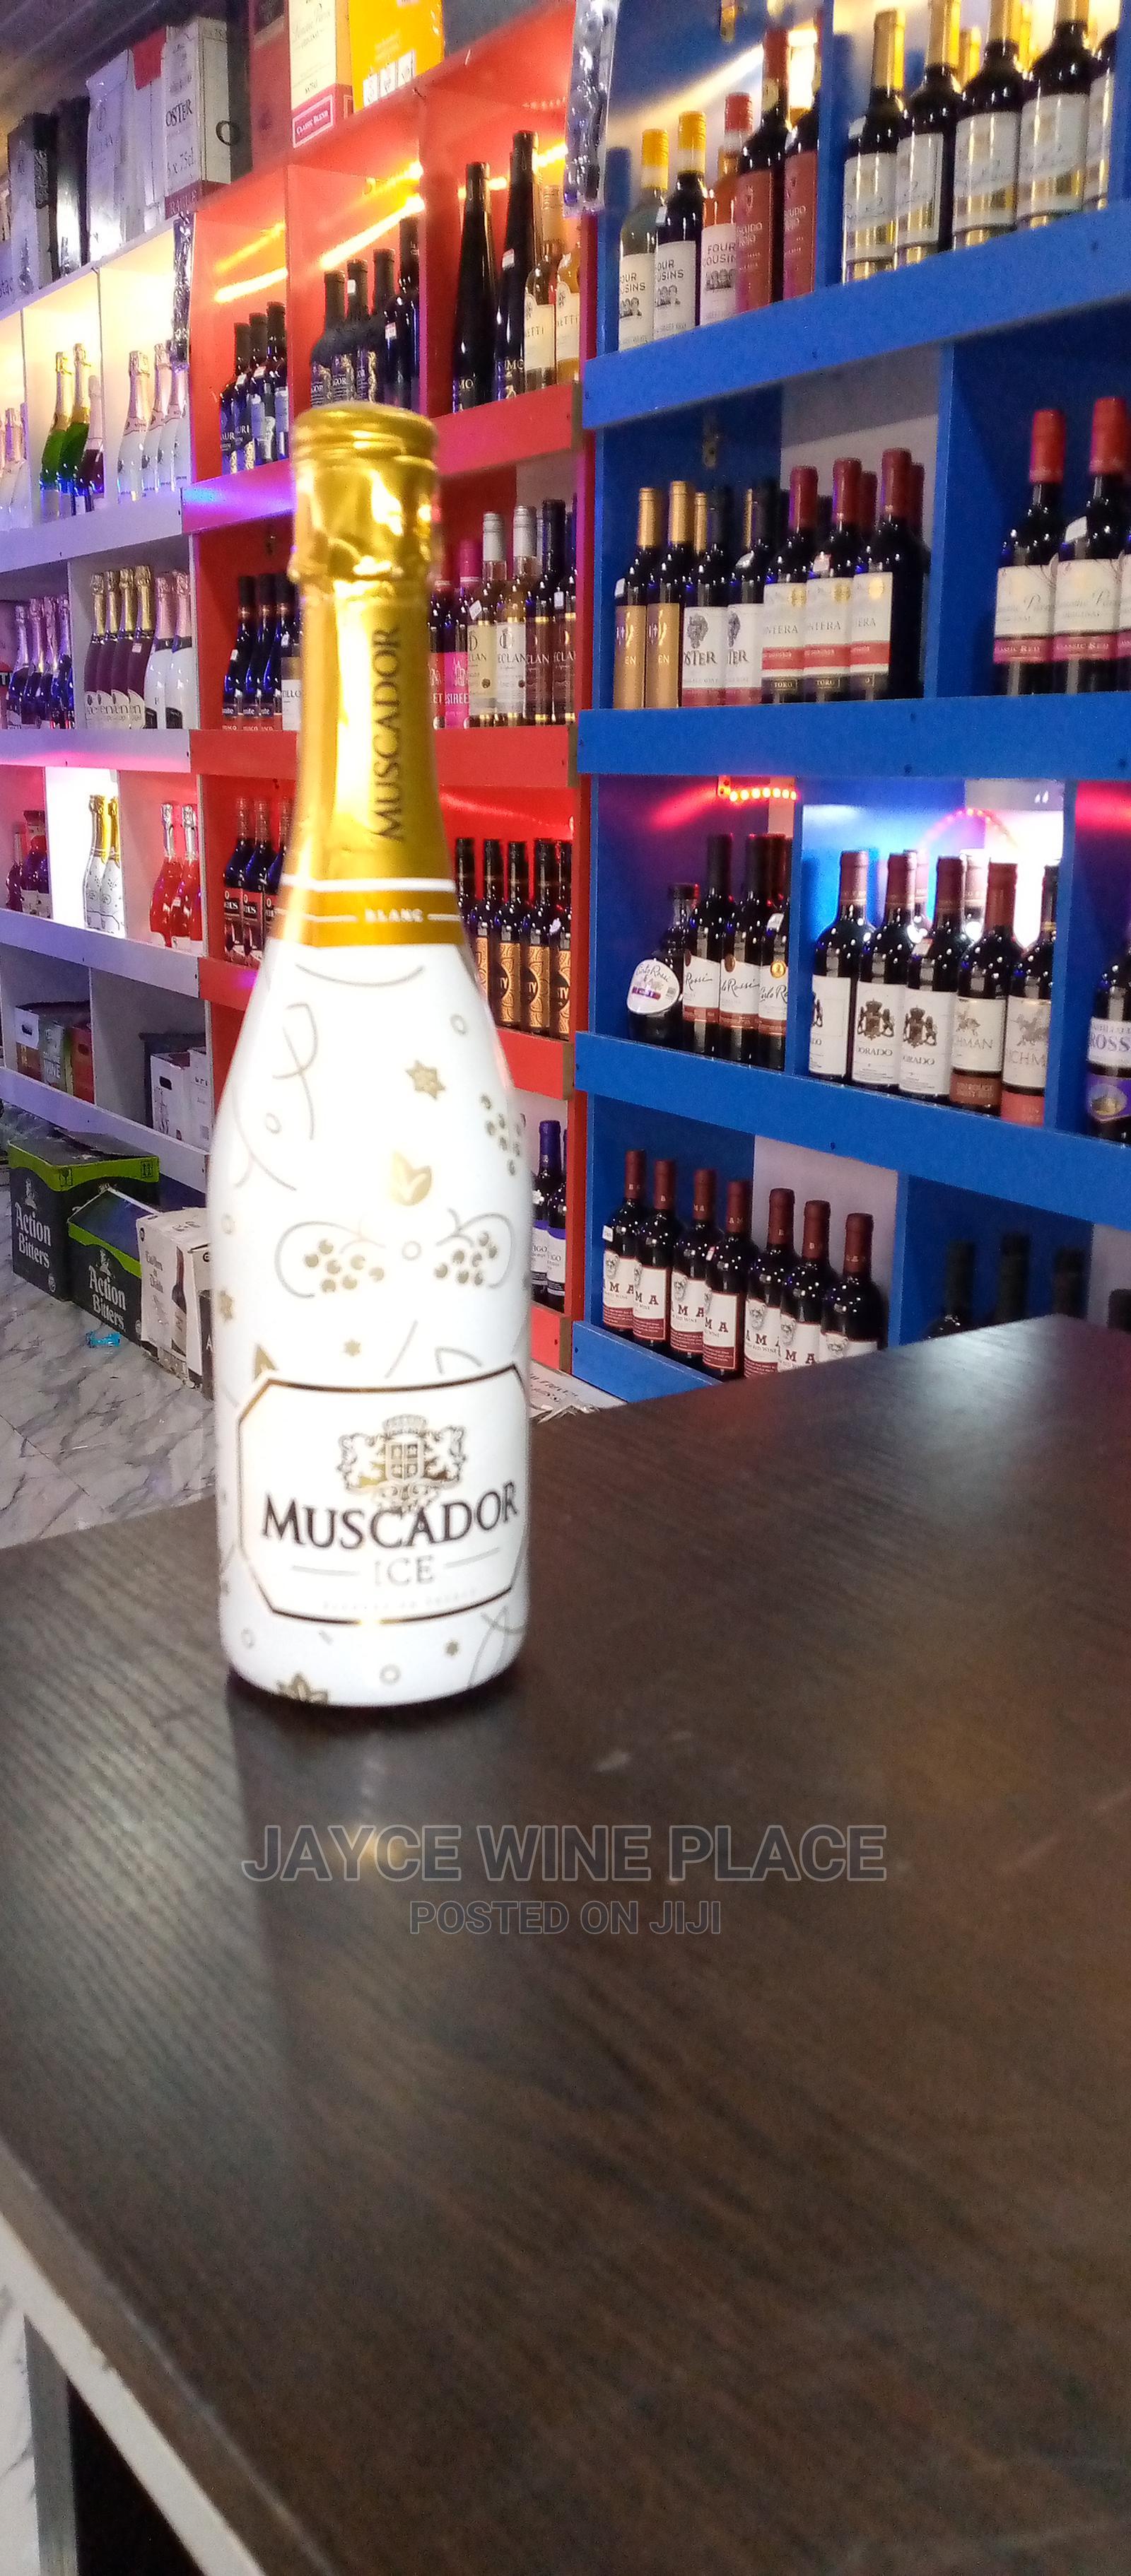 Muscador Ice Wine